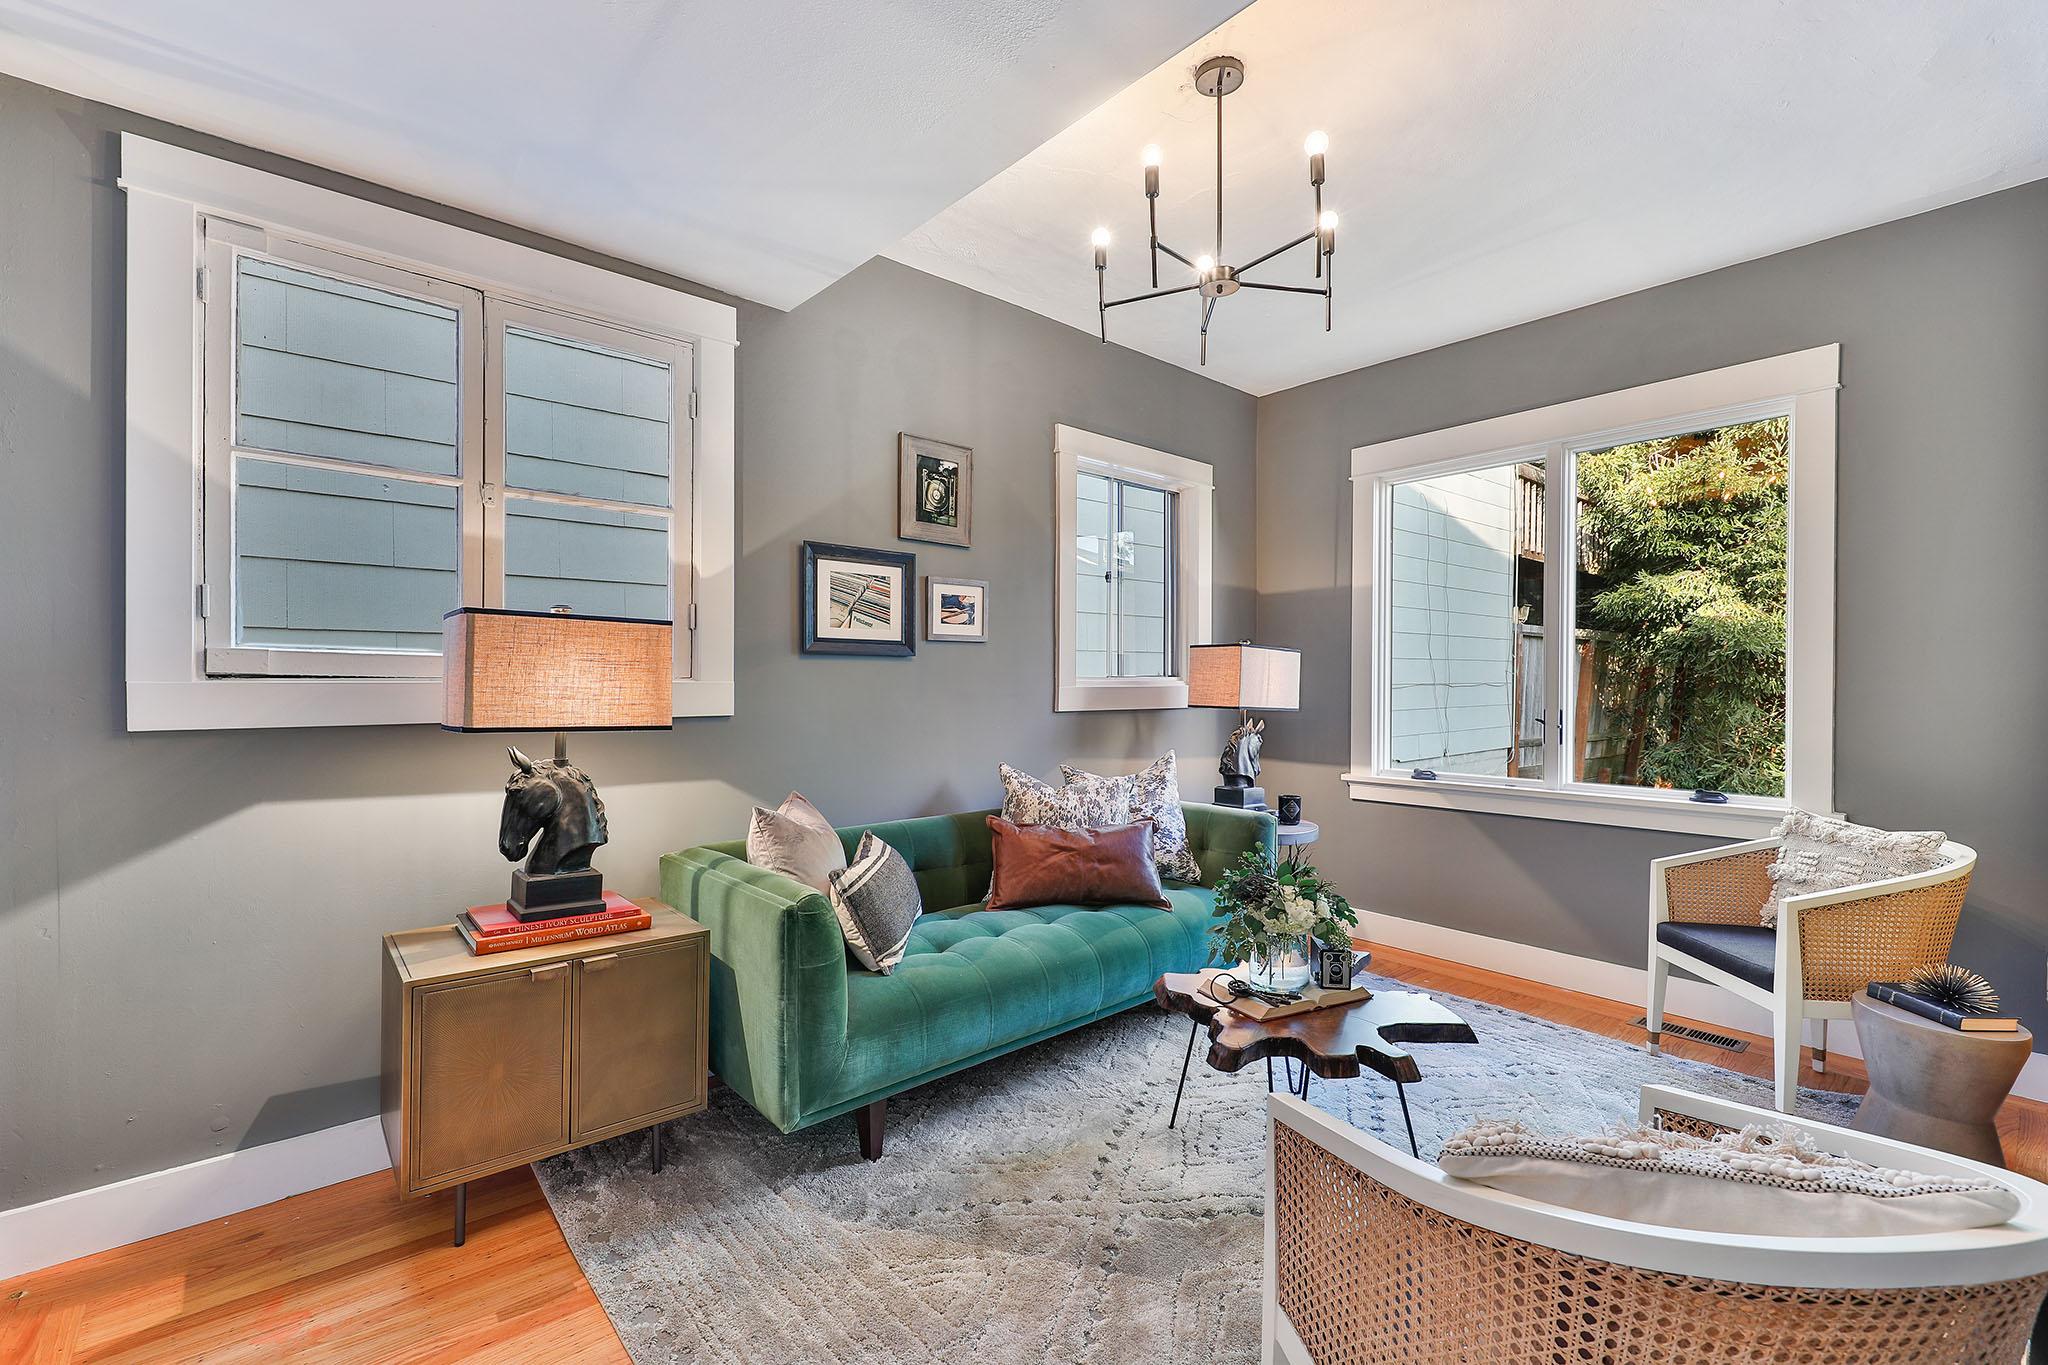 San Francisco Luxury Home - lIVING rOOM